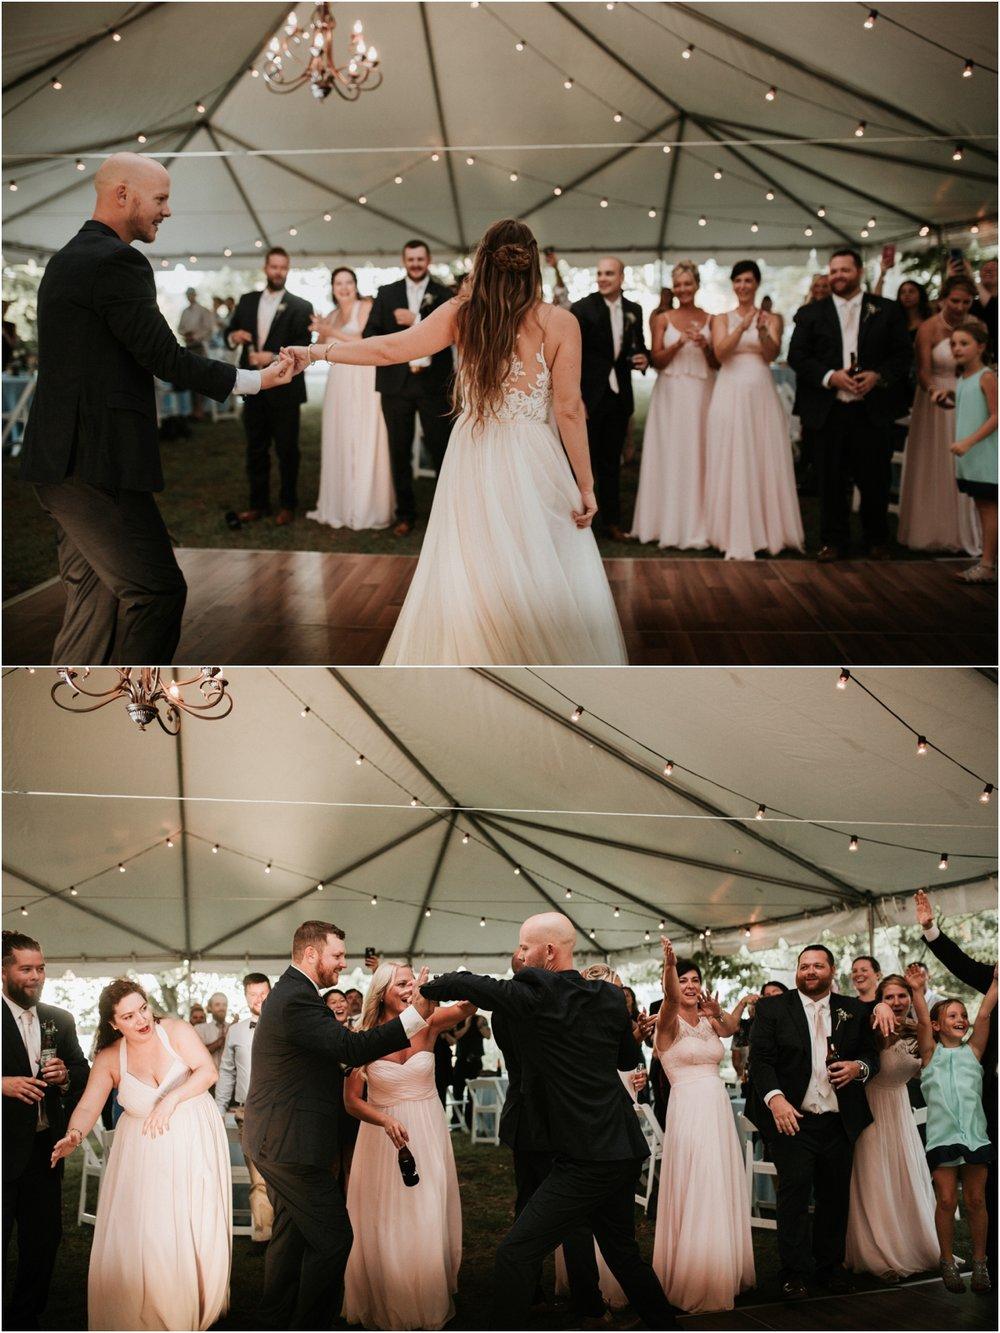 Stowe-manor-wedding-belmont-nc_0057.jpg